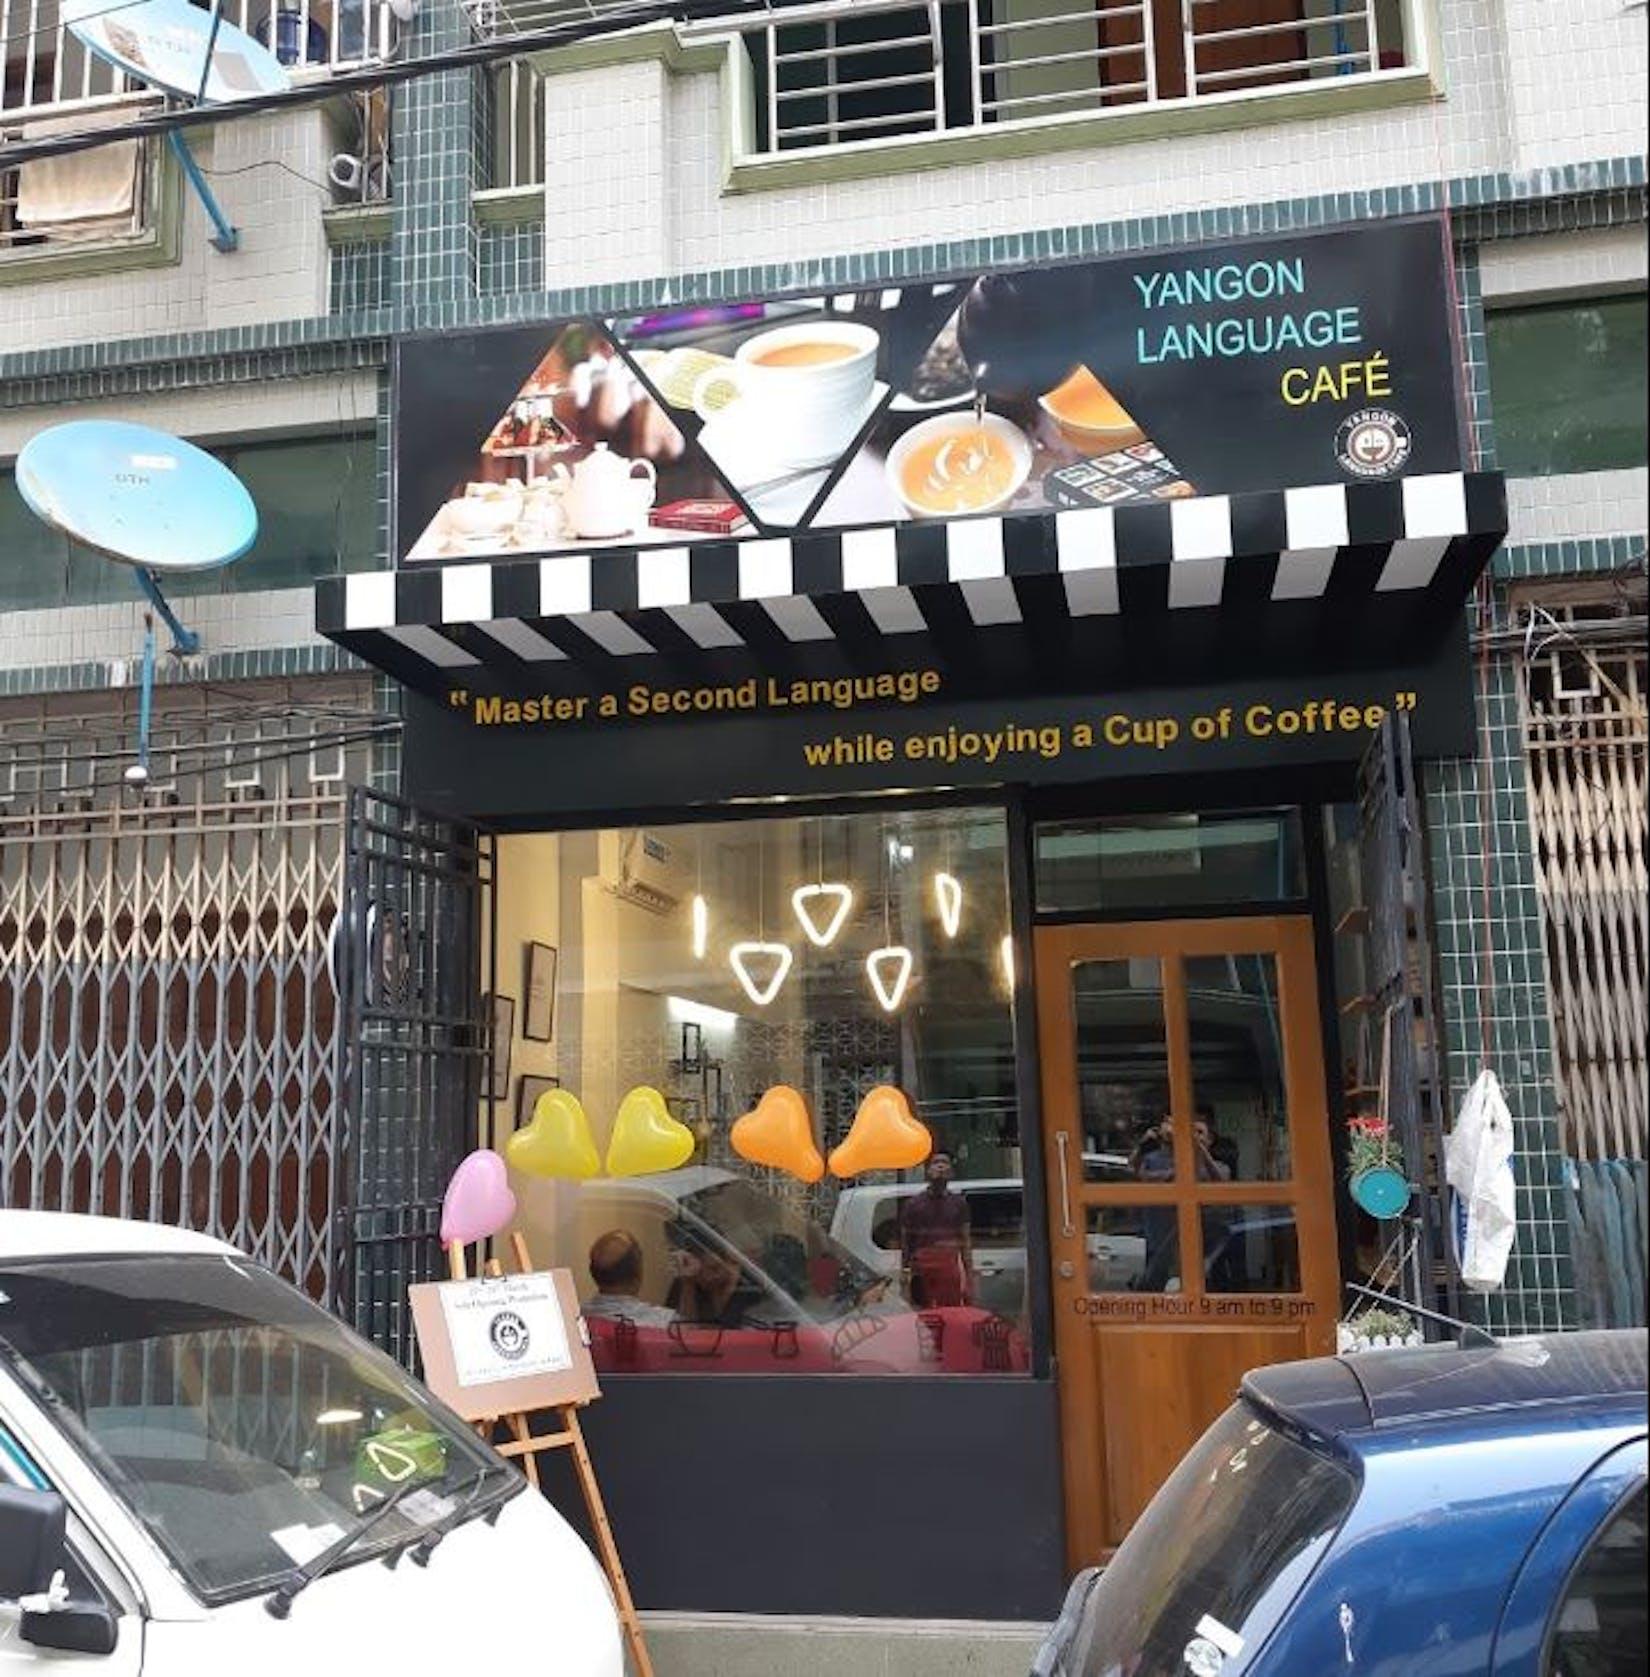 Yangon Language Cafe | yathar